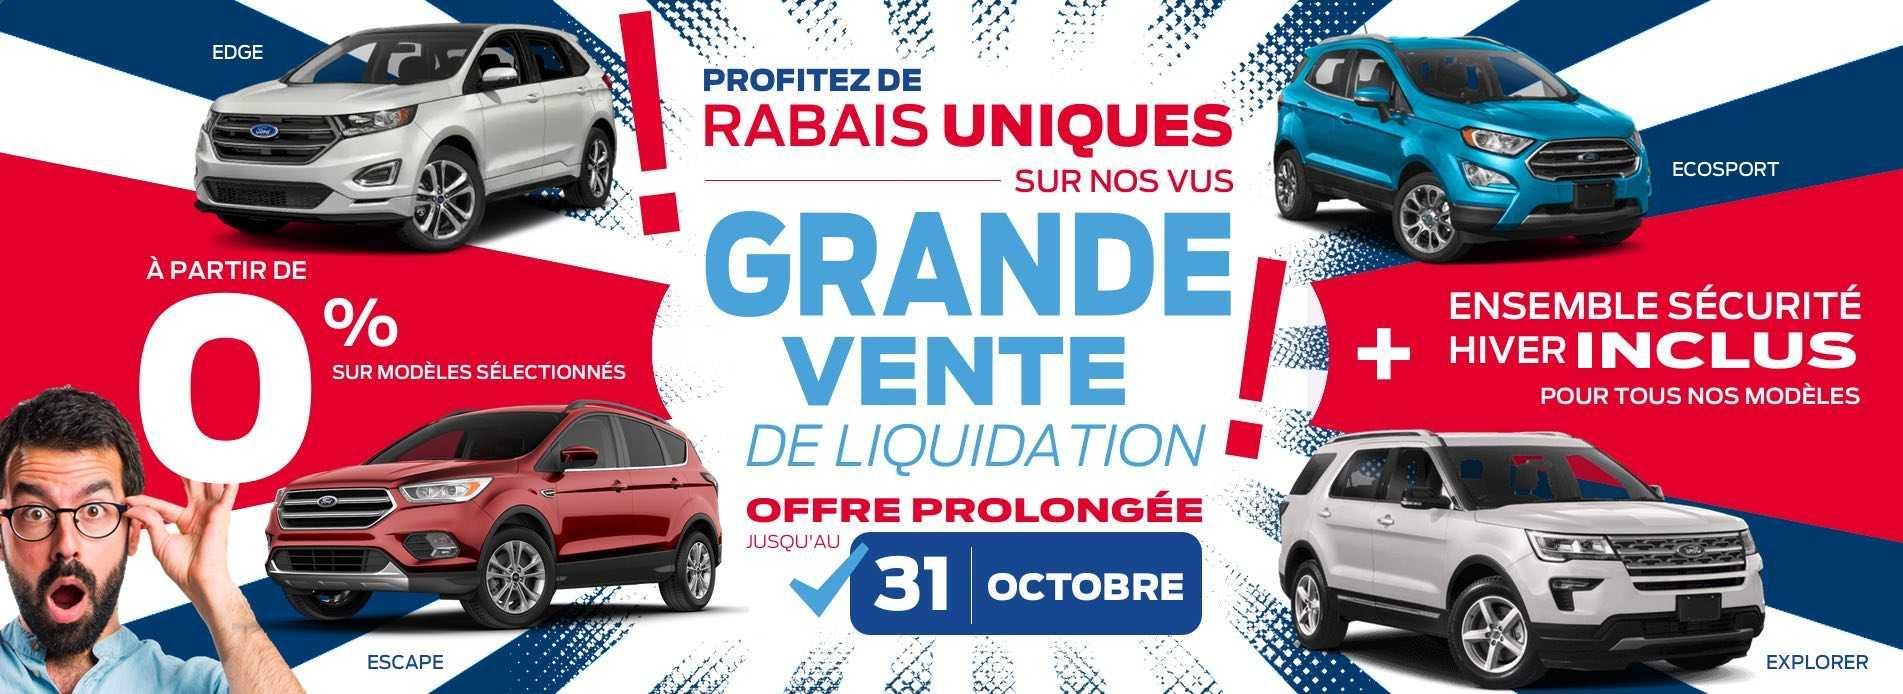 Grande vente de liquidation jusqu'au 31 octobre